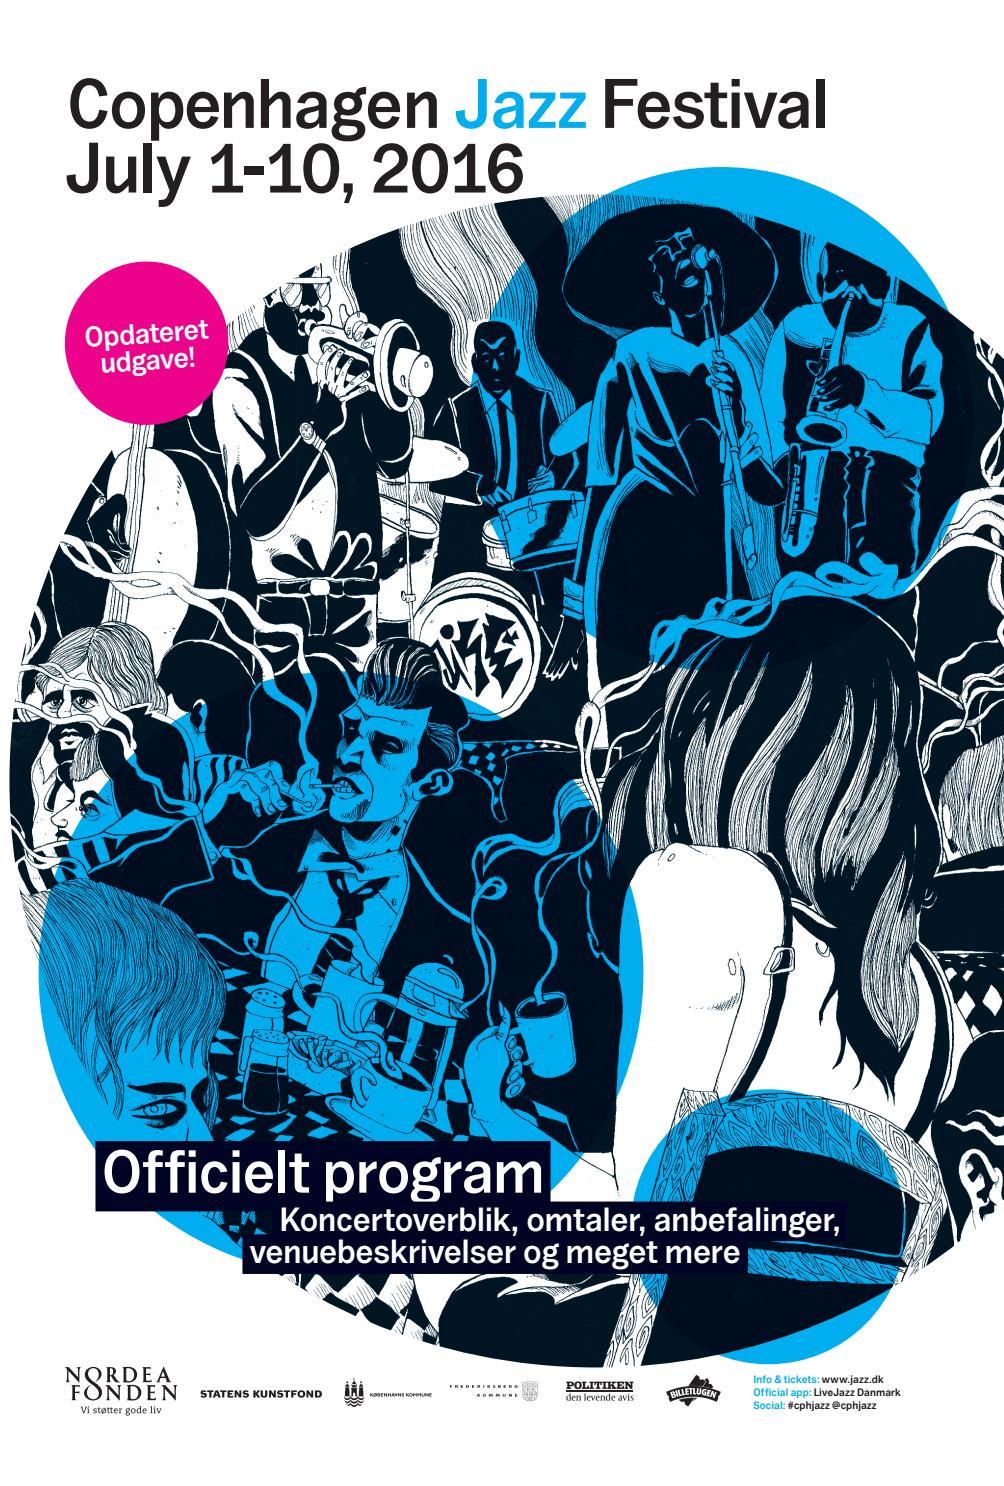 Copenhagen jazz festival 2016 by copenhagen jazz festival   issuu